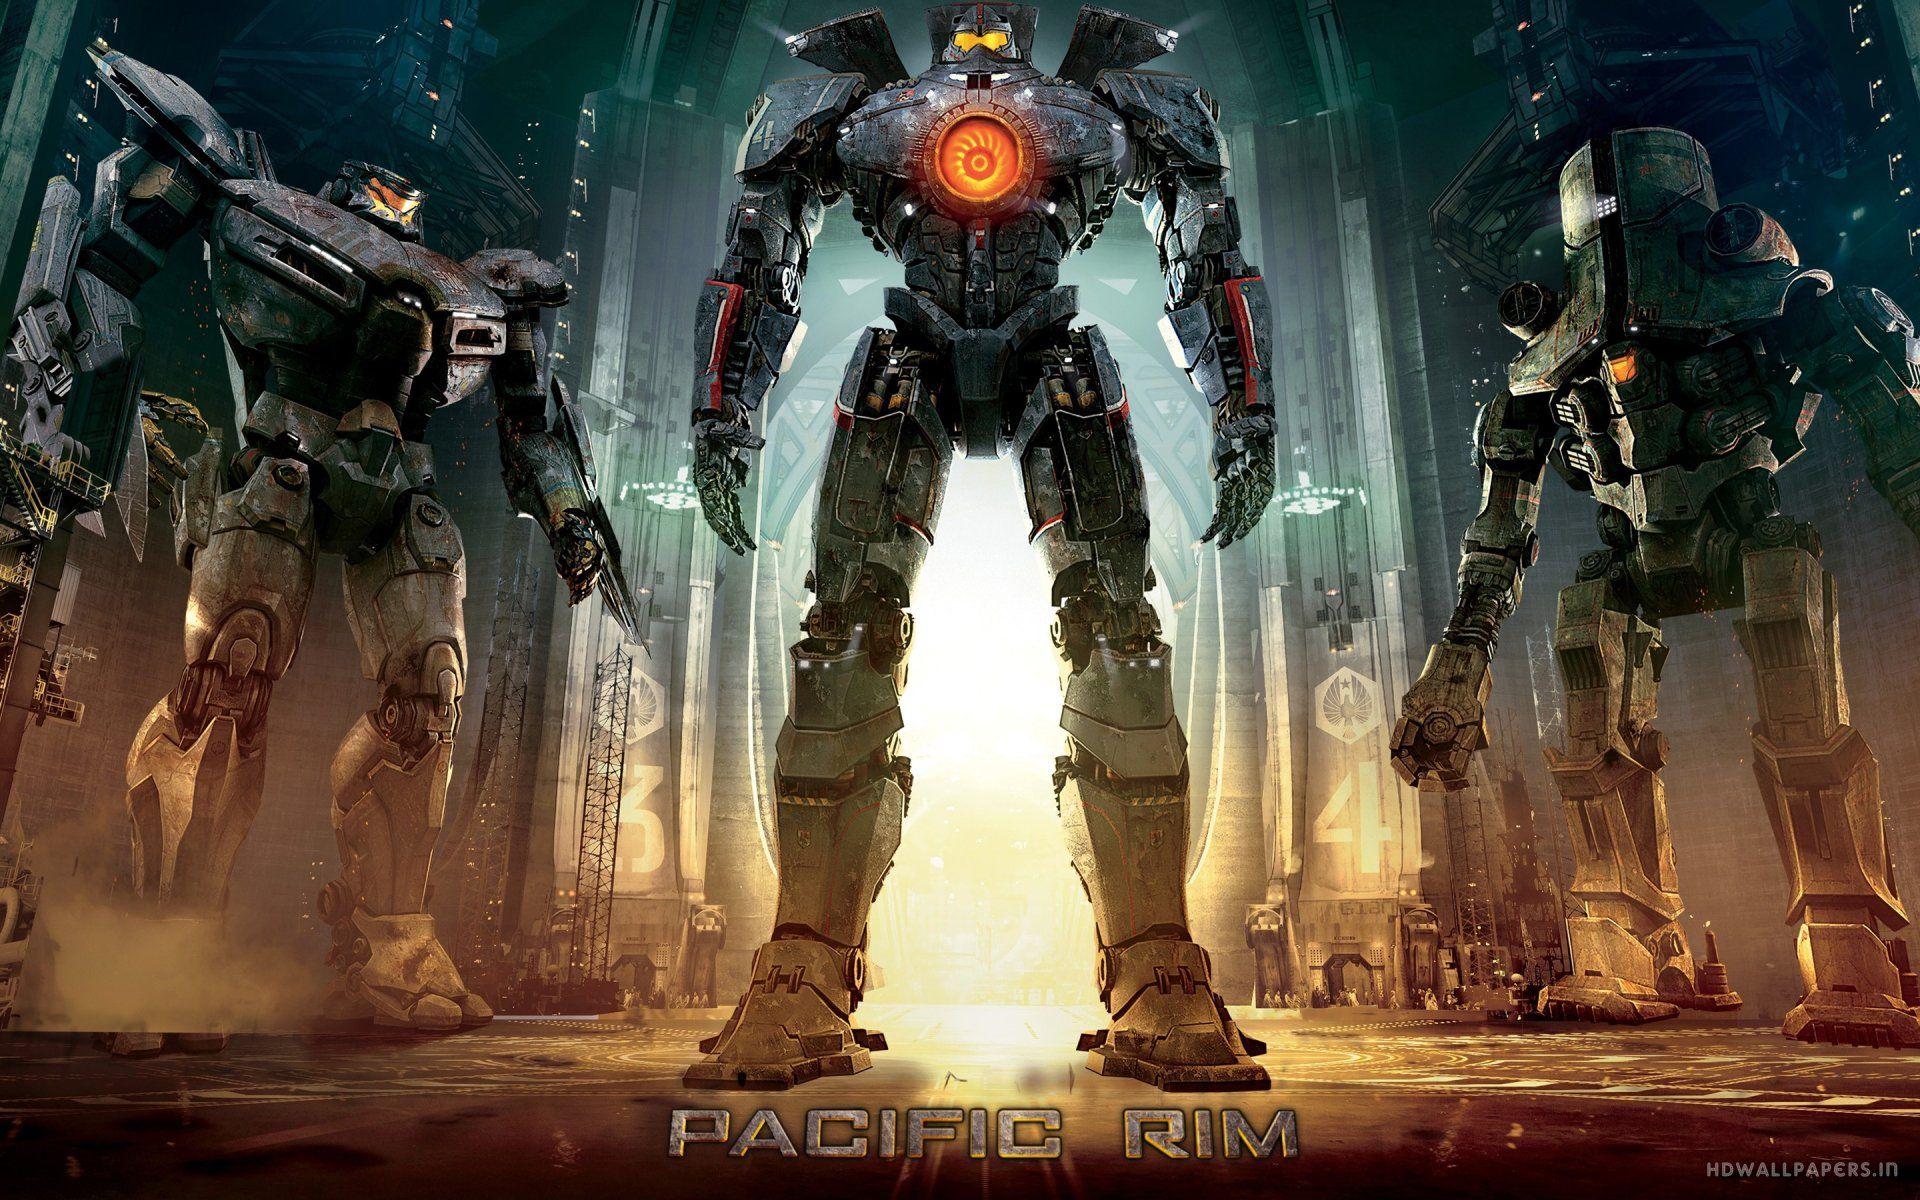 【館長聊影】6分鐘速看科幻怪獸電影《環太平洋》鋼鐵機甲抵御外星殖民巨獸_嗶哩嗶哩 (゜-゜)つロ 干杯~-bilibili